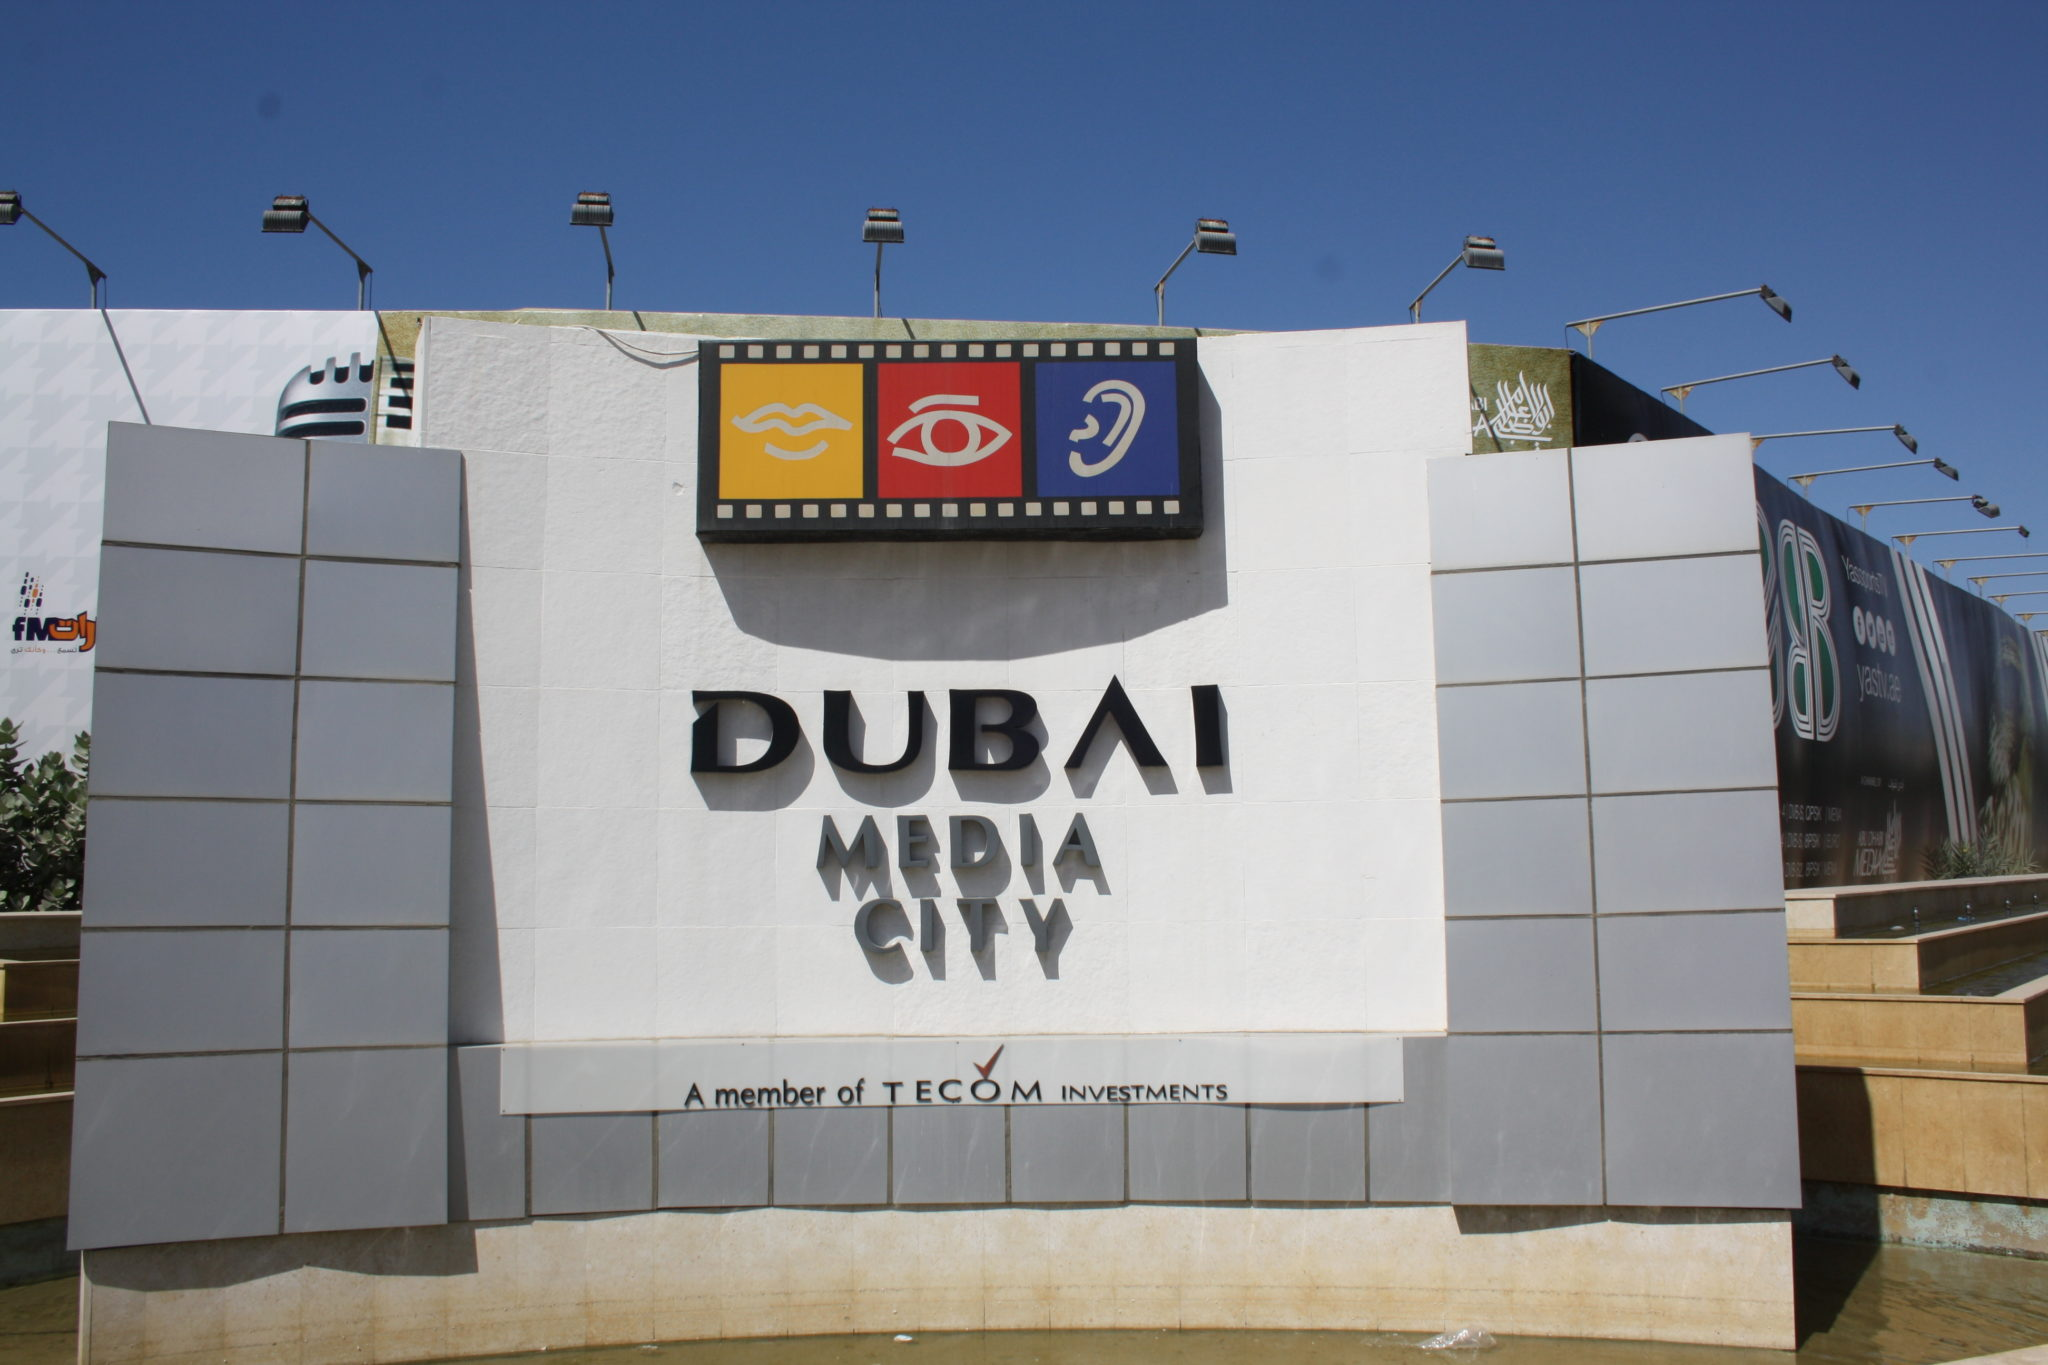 Dubai Media City for Business License